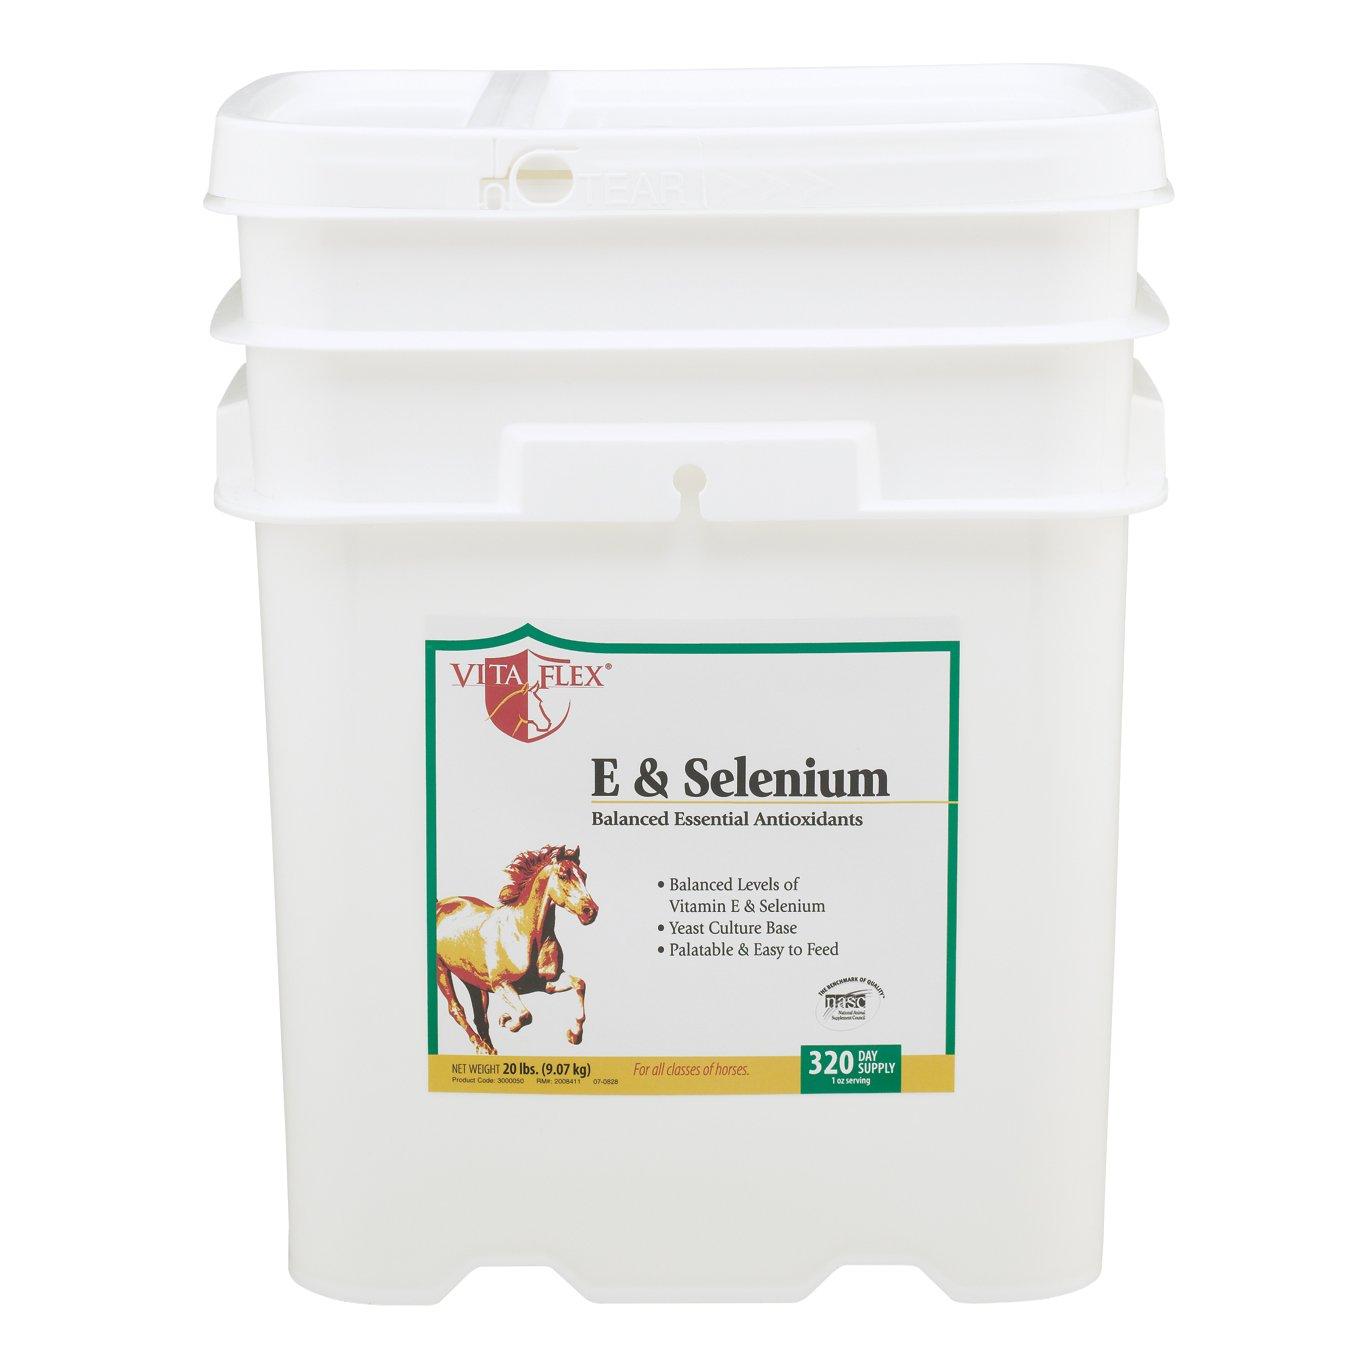 Vita Flex E & Selenium Balanced Essential Antioxidants, 320 Day Supply, 20 Pound